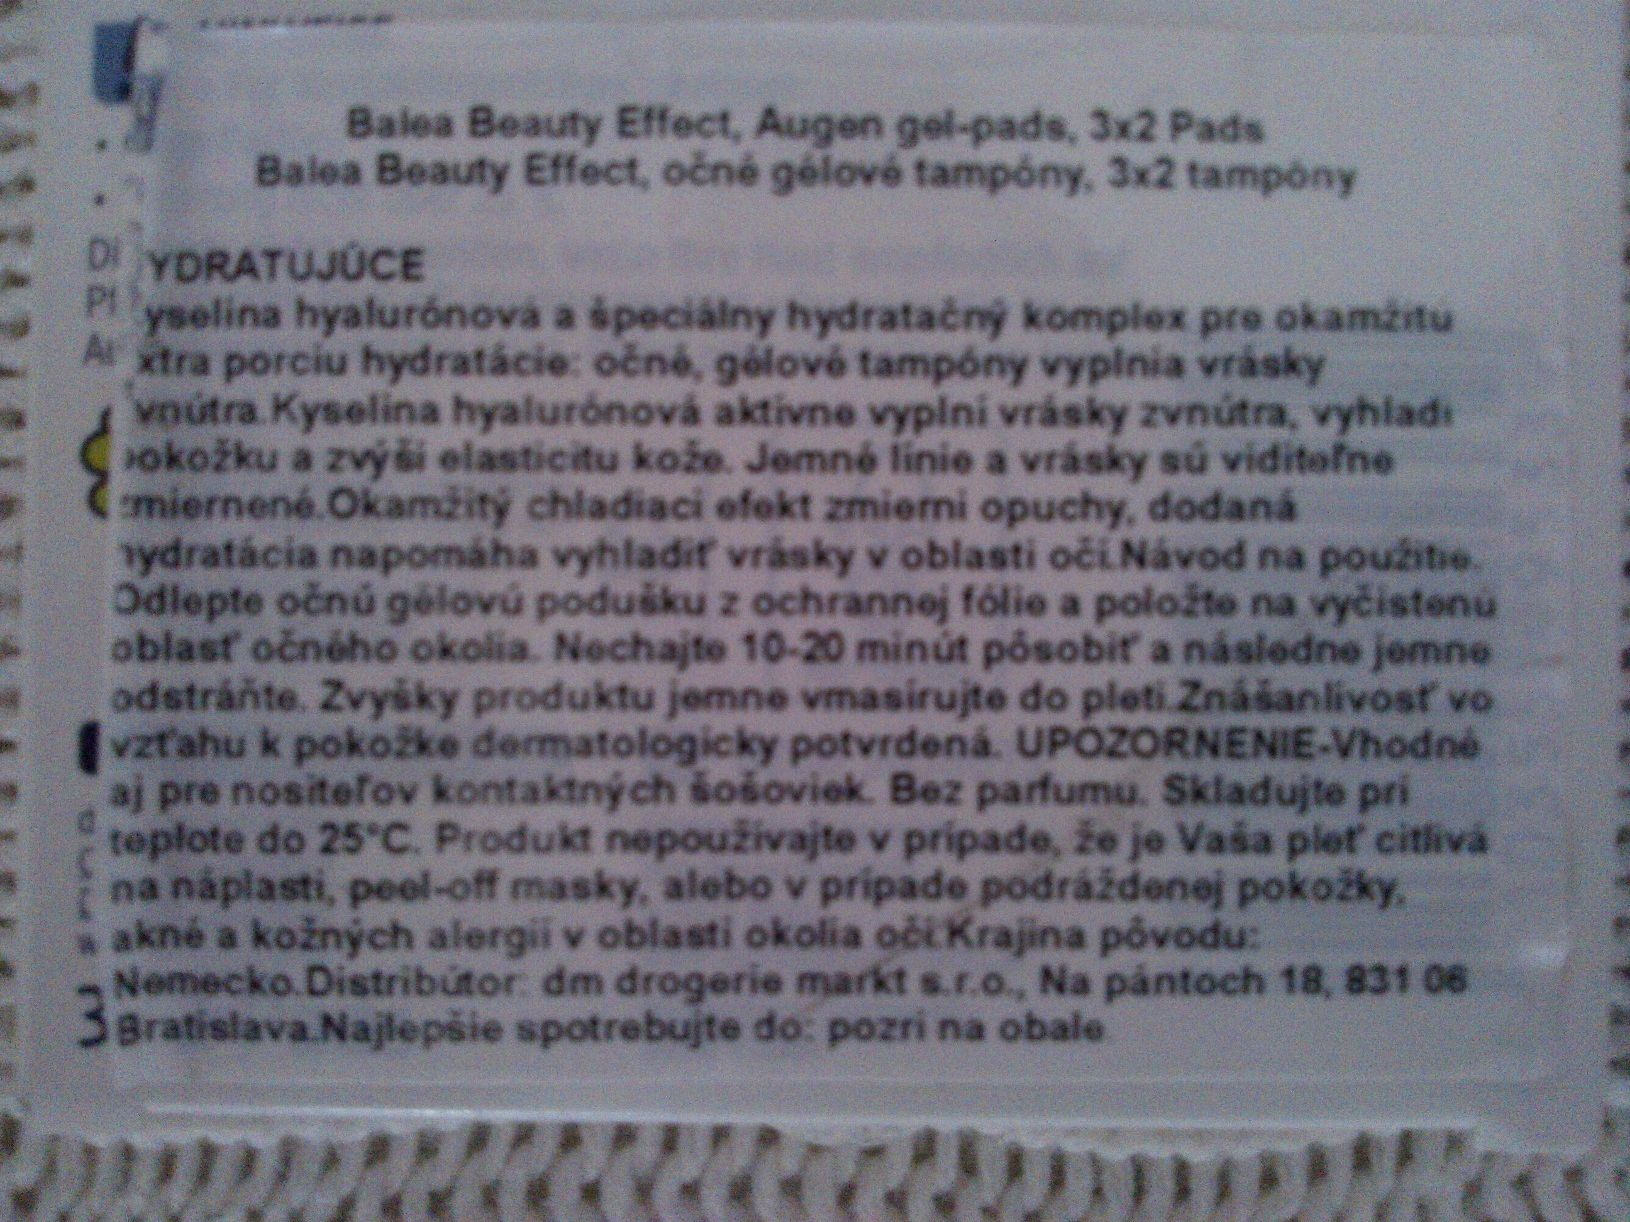 Popis gelových náplastí Balea, v balení sú 3 páry, gél obsahuje: